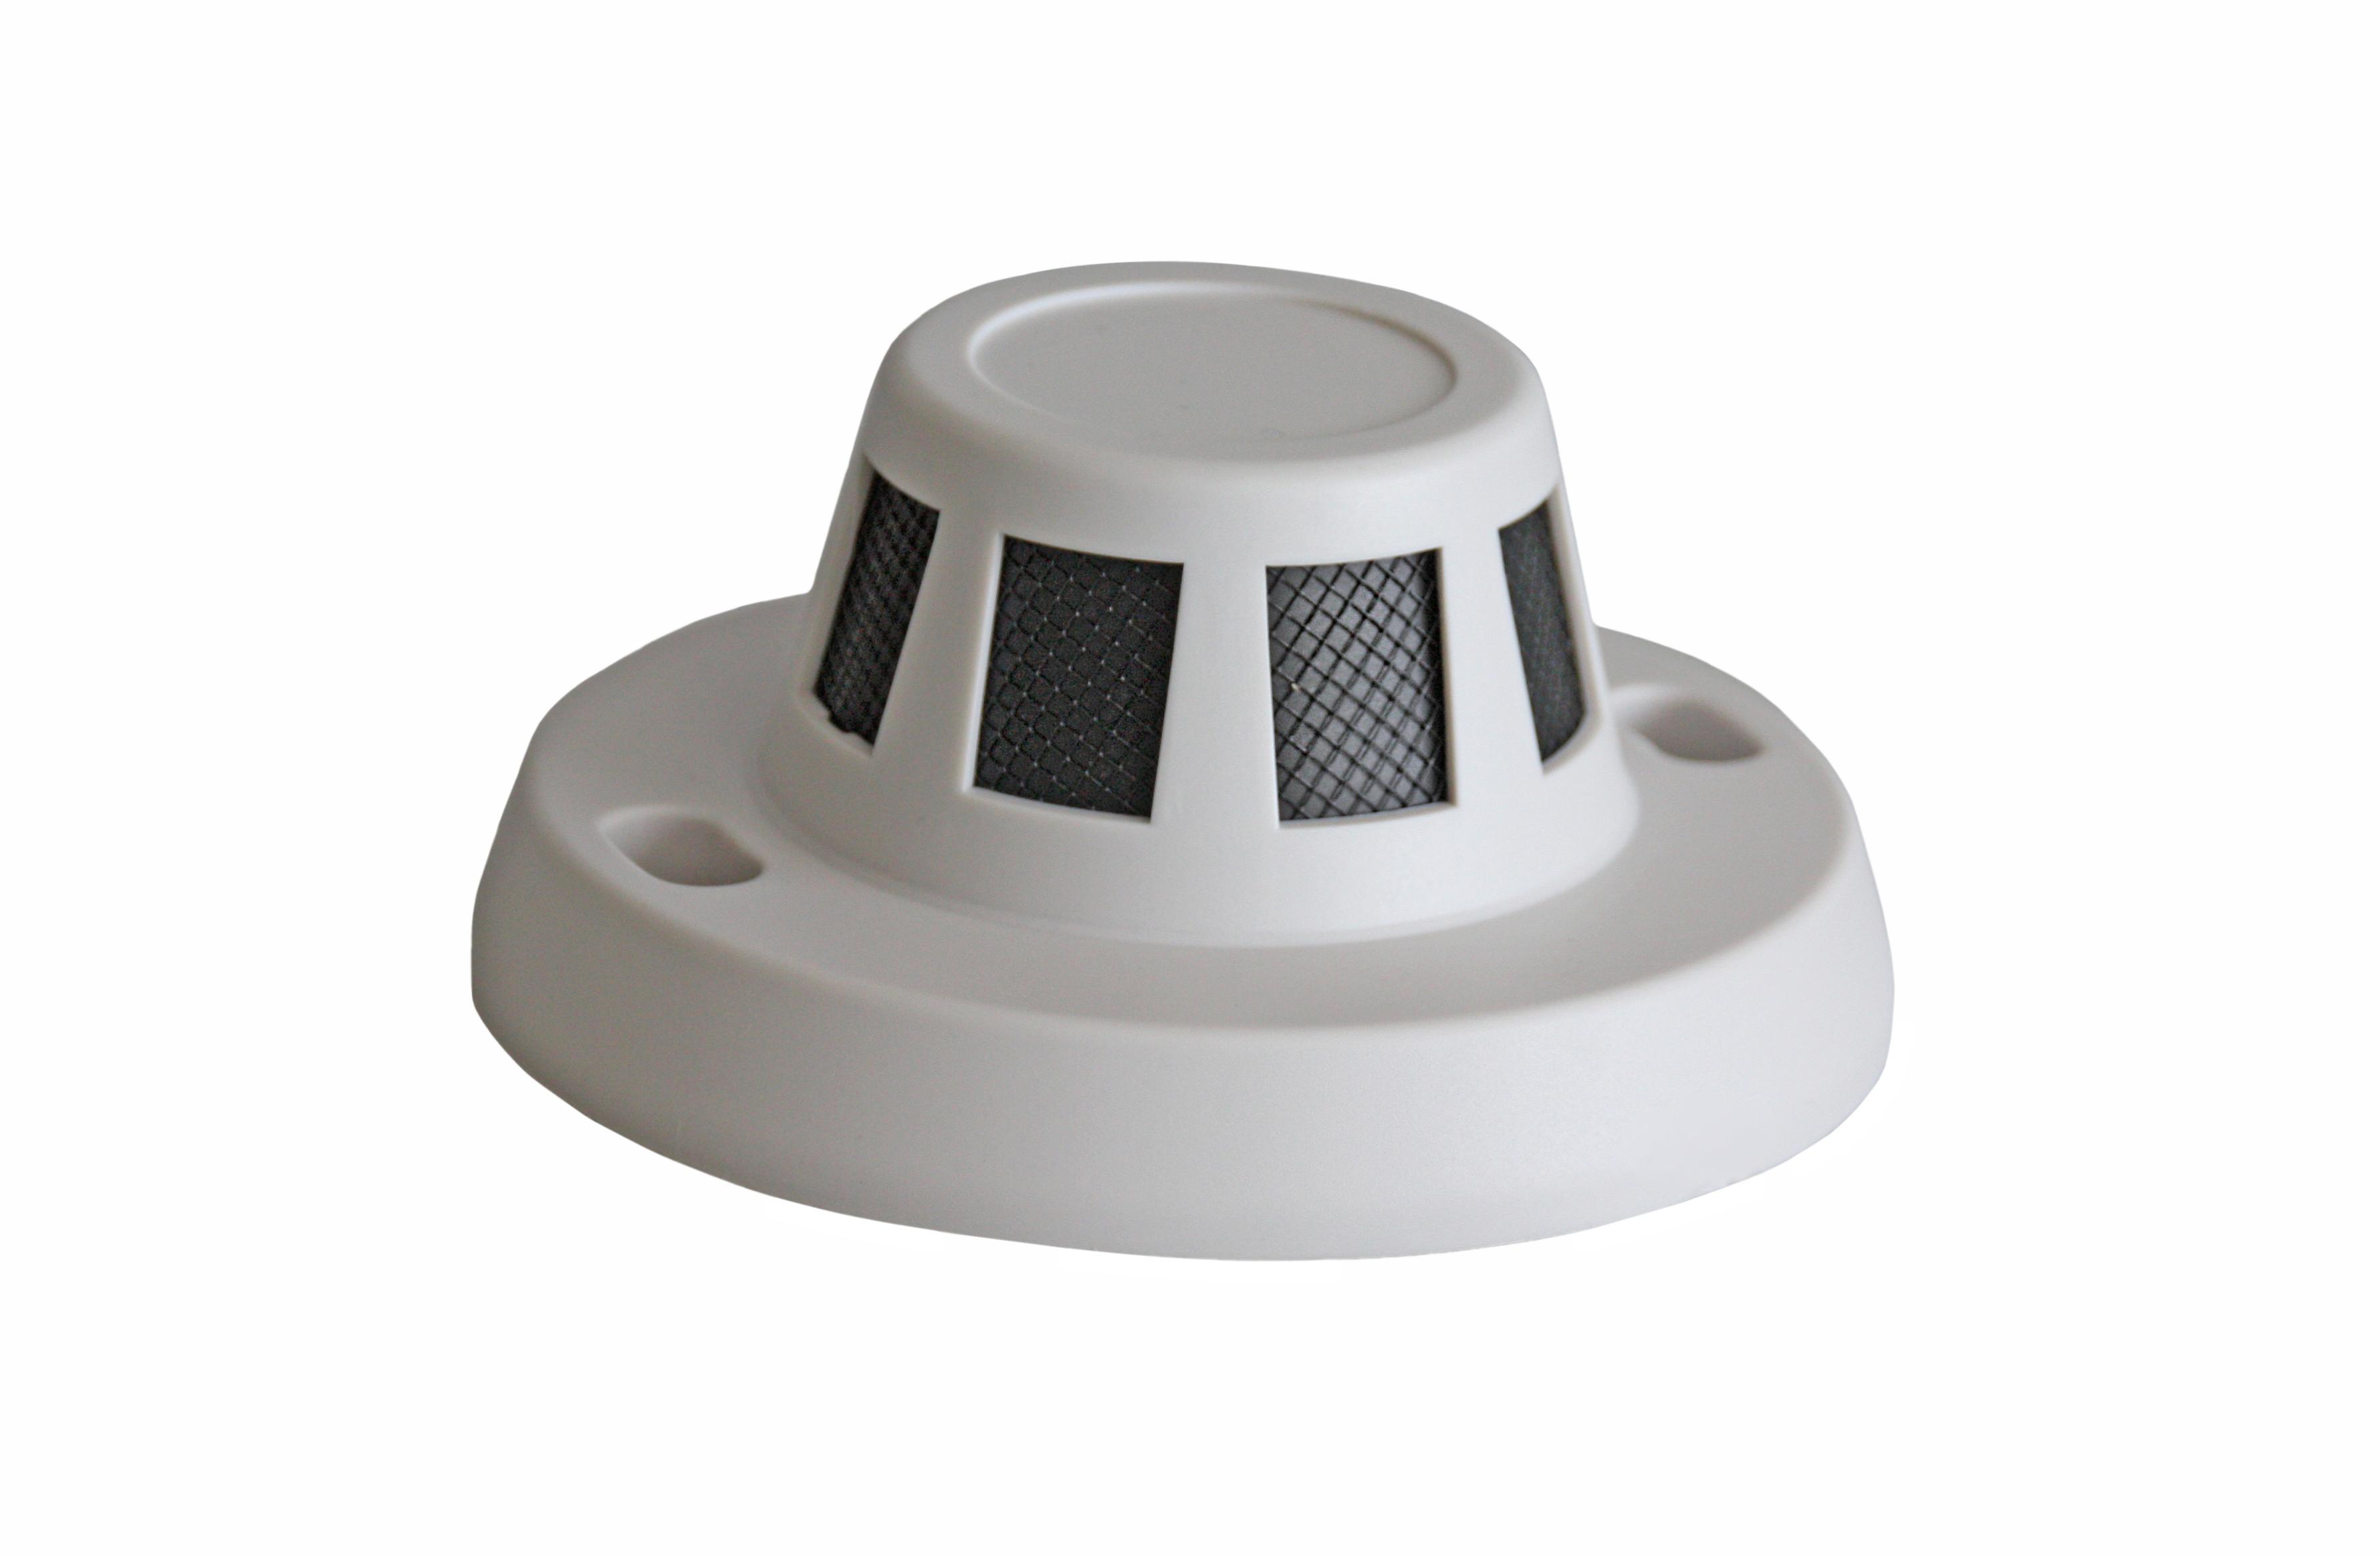 rauchmeldekamera bei prof video berwachung. Black Bedroom Furniture Sets. Home Design Ideas